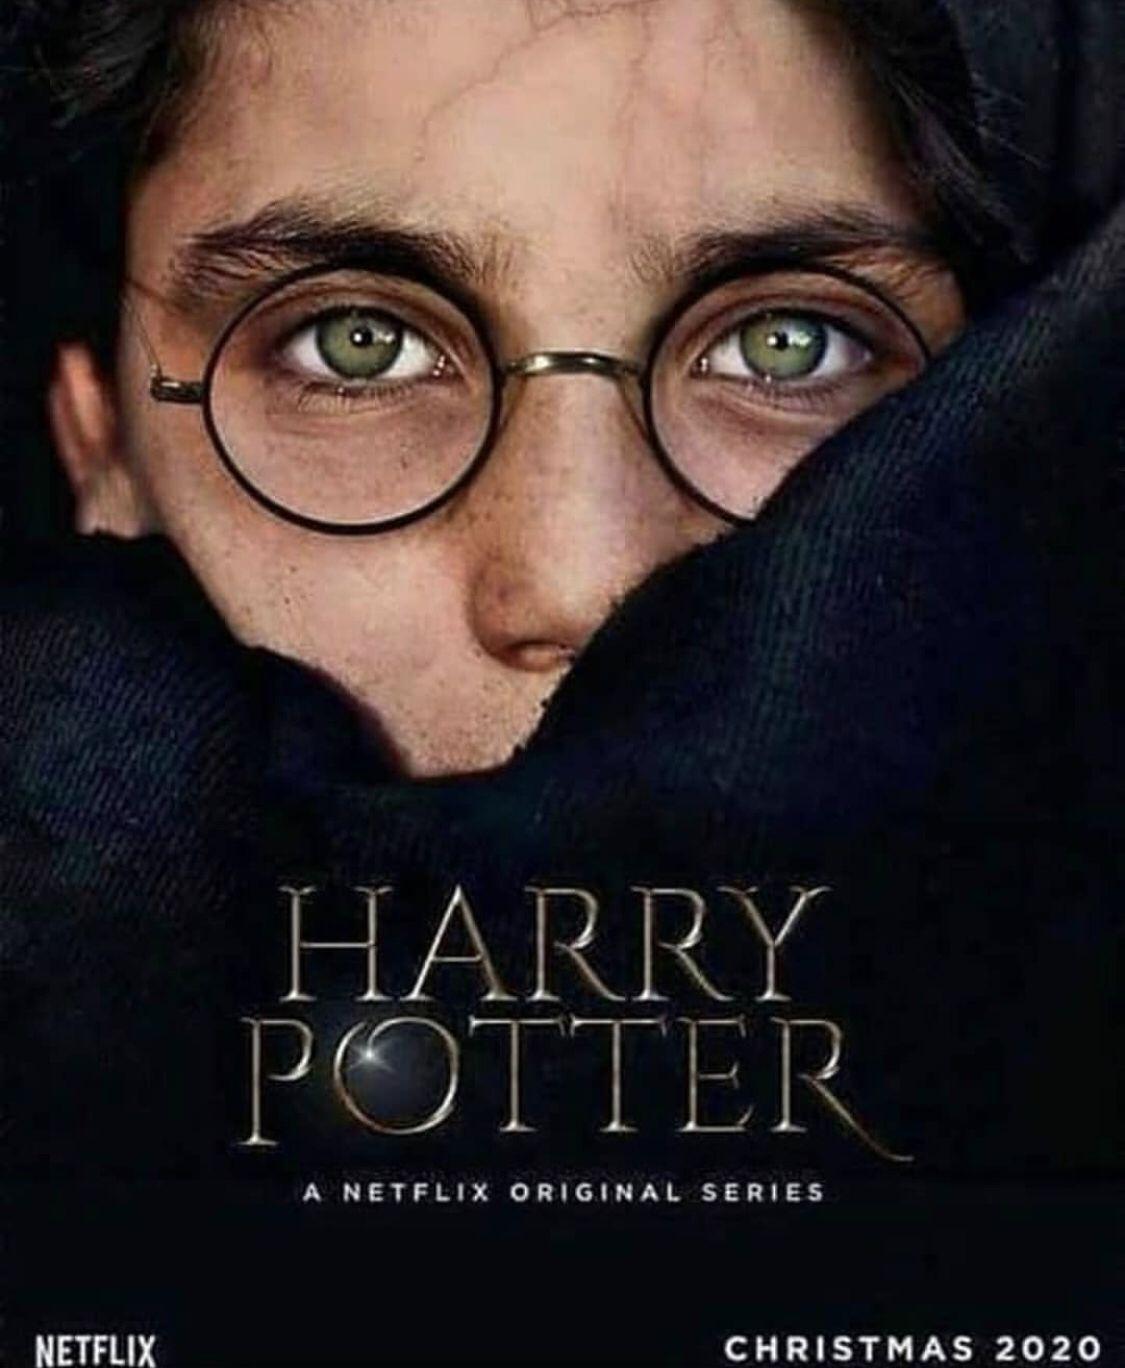 Pin By Eastenbrick On Harry Potter Potter Audio Books Harry Potter